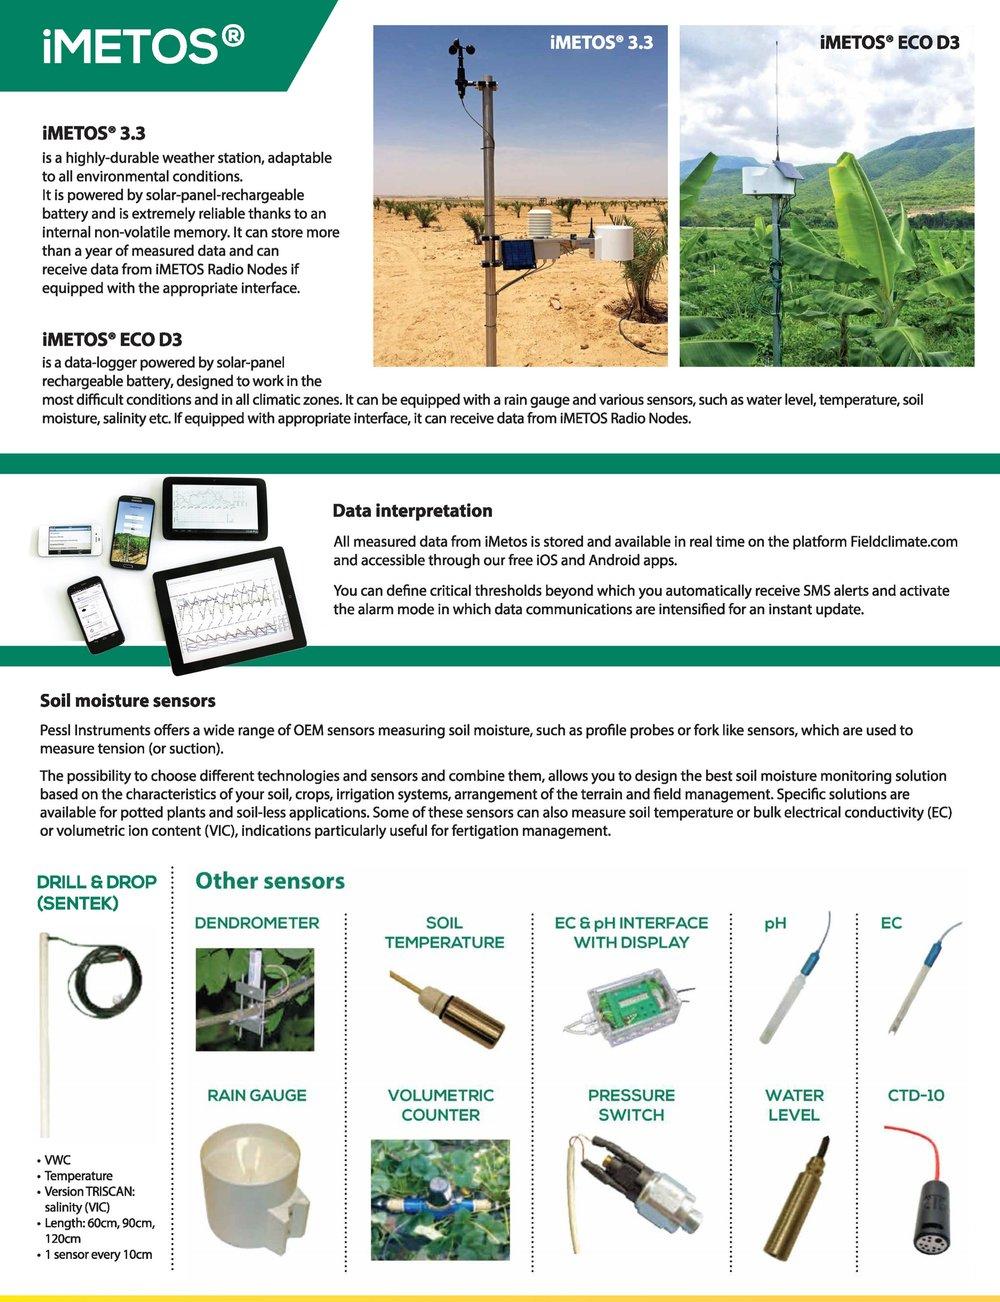 AGree iMetos brochure.jpg